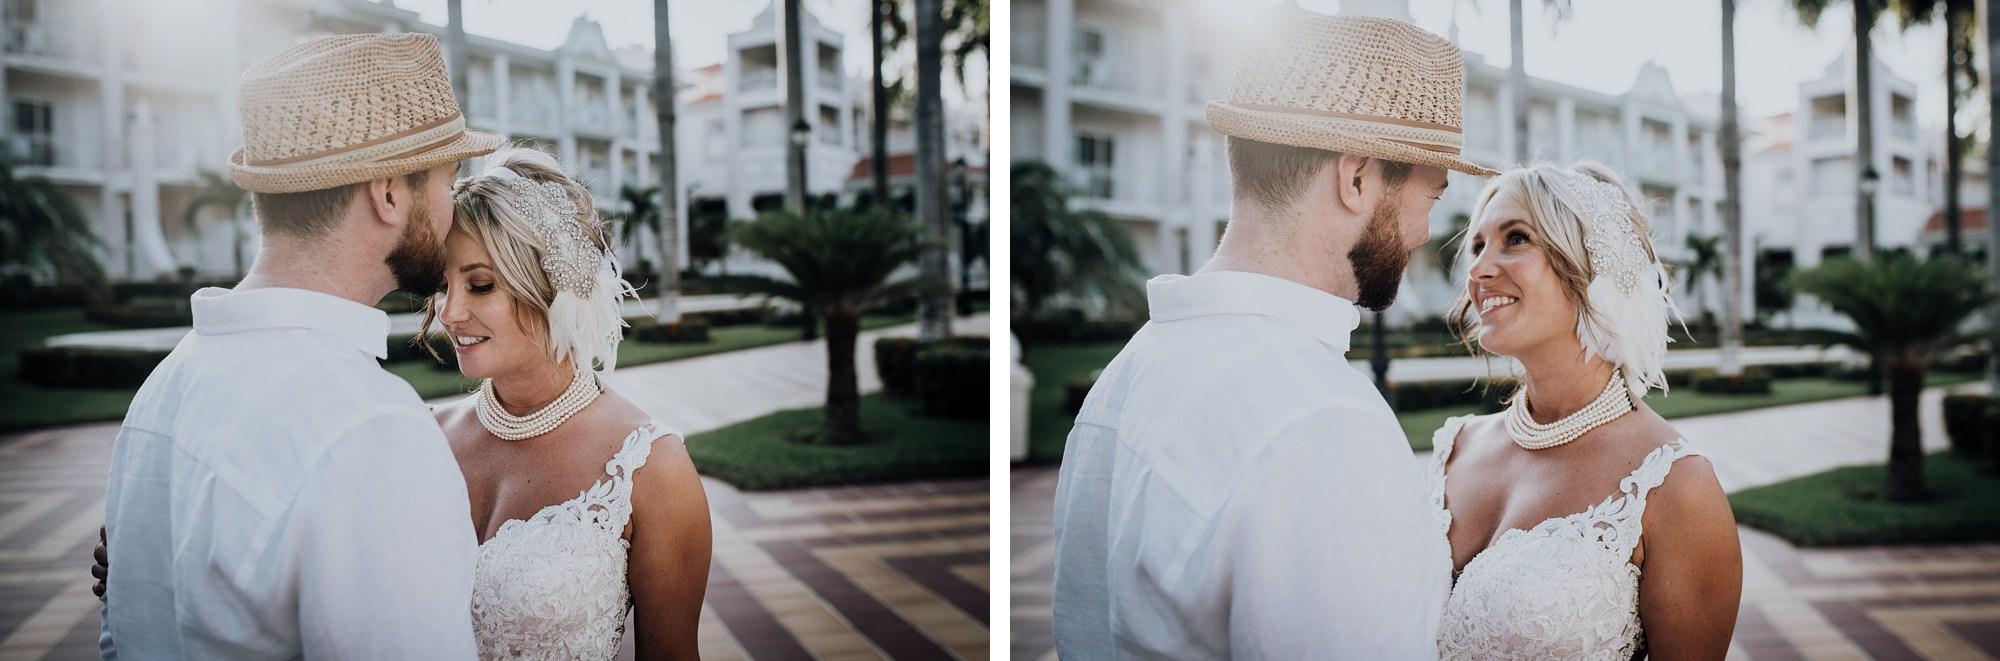 bride and groom embracing mexico destination wedding